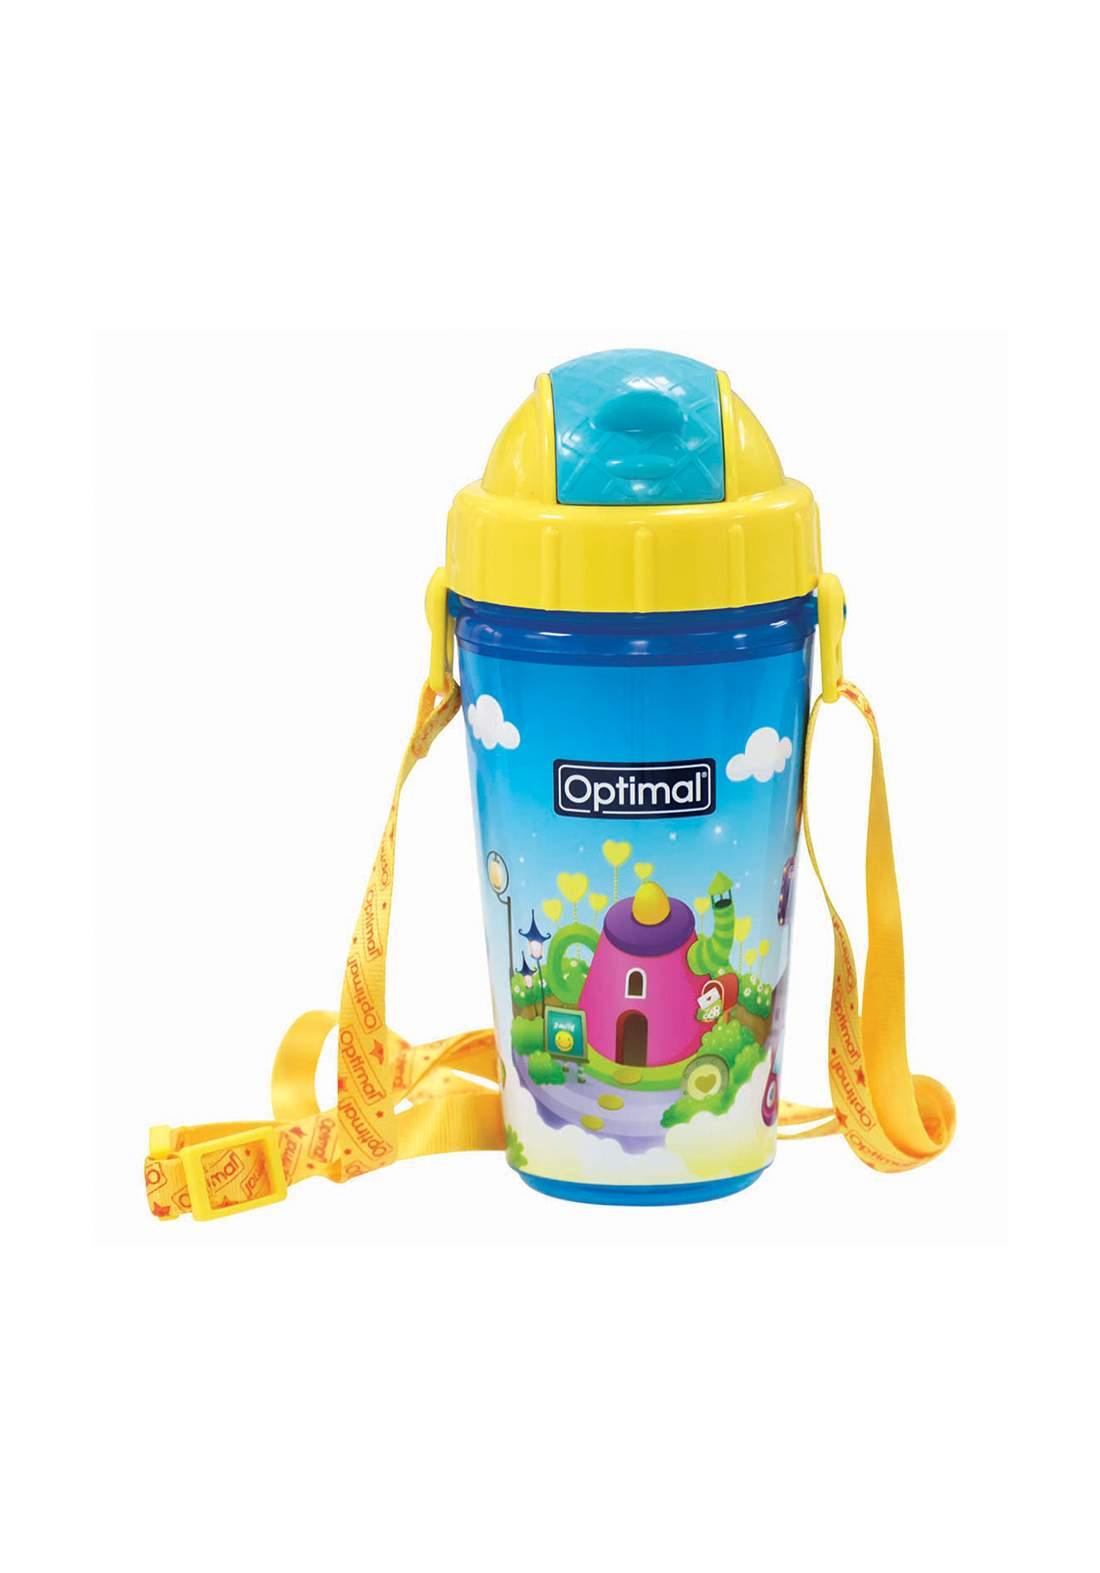 Optimal Silicone Spout Bottle250ML (+12) Blue قدح شرب الماء مع غطاء للاطفال